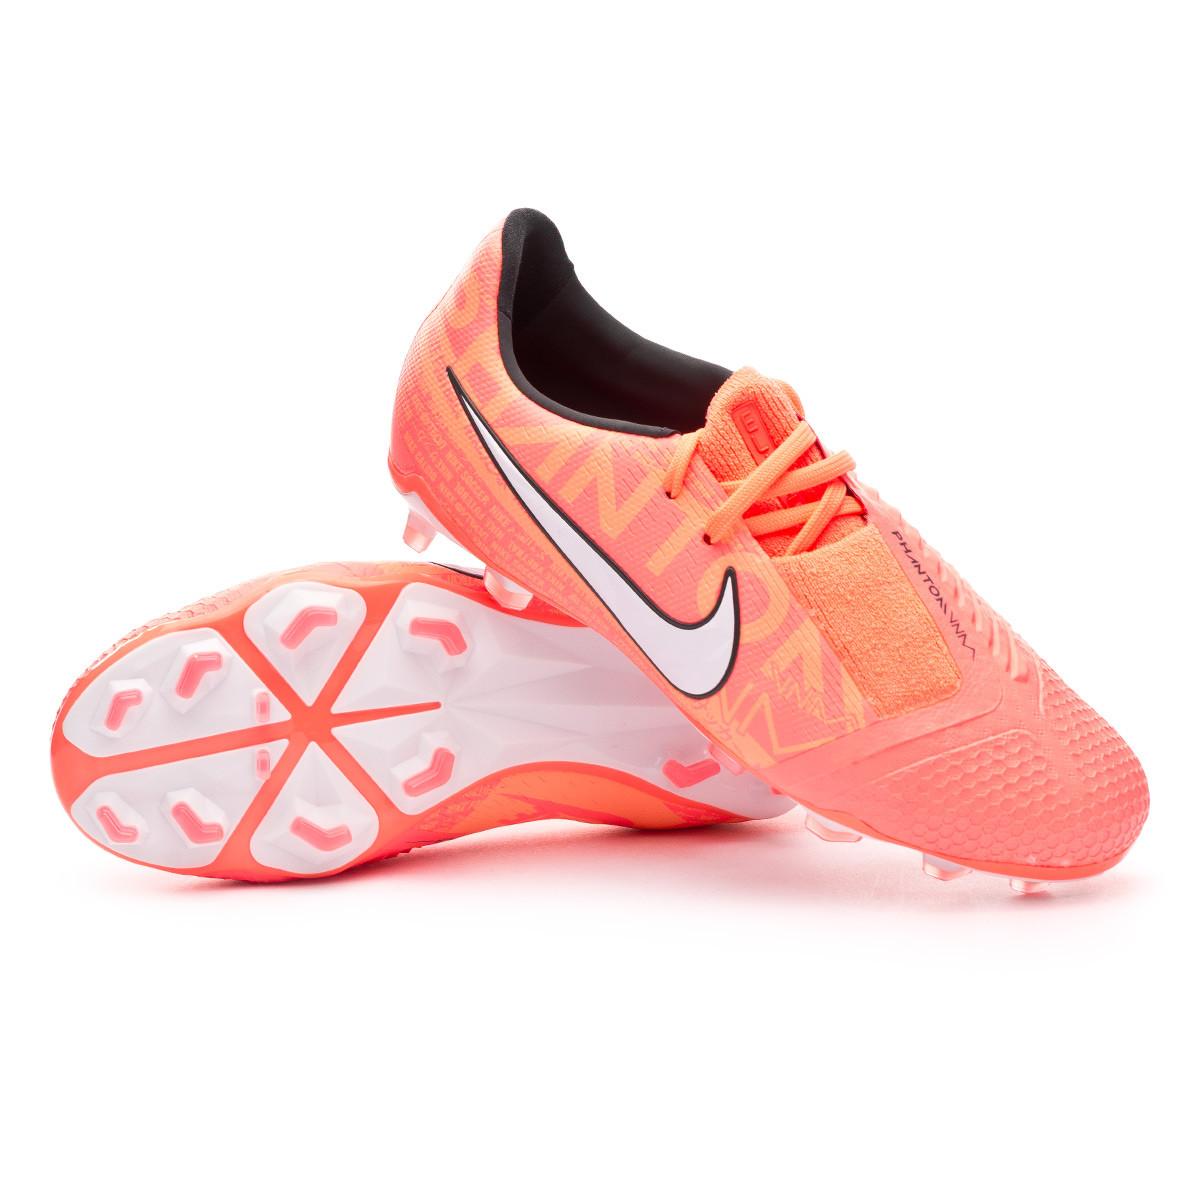 Frenesí Tulipanes chisme  Football Boots Nike Phantom Venom Elite FG Niño Bright mango-White-Orange  pulse - Football store Fútbol Emotion